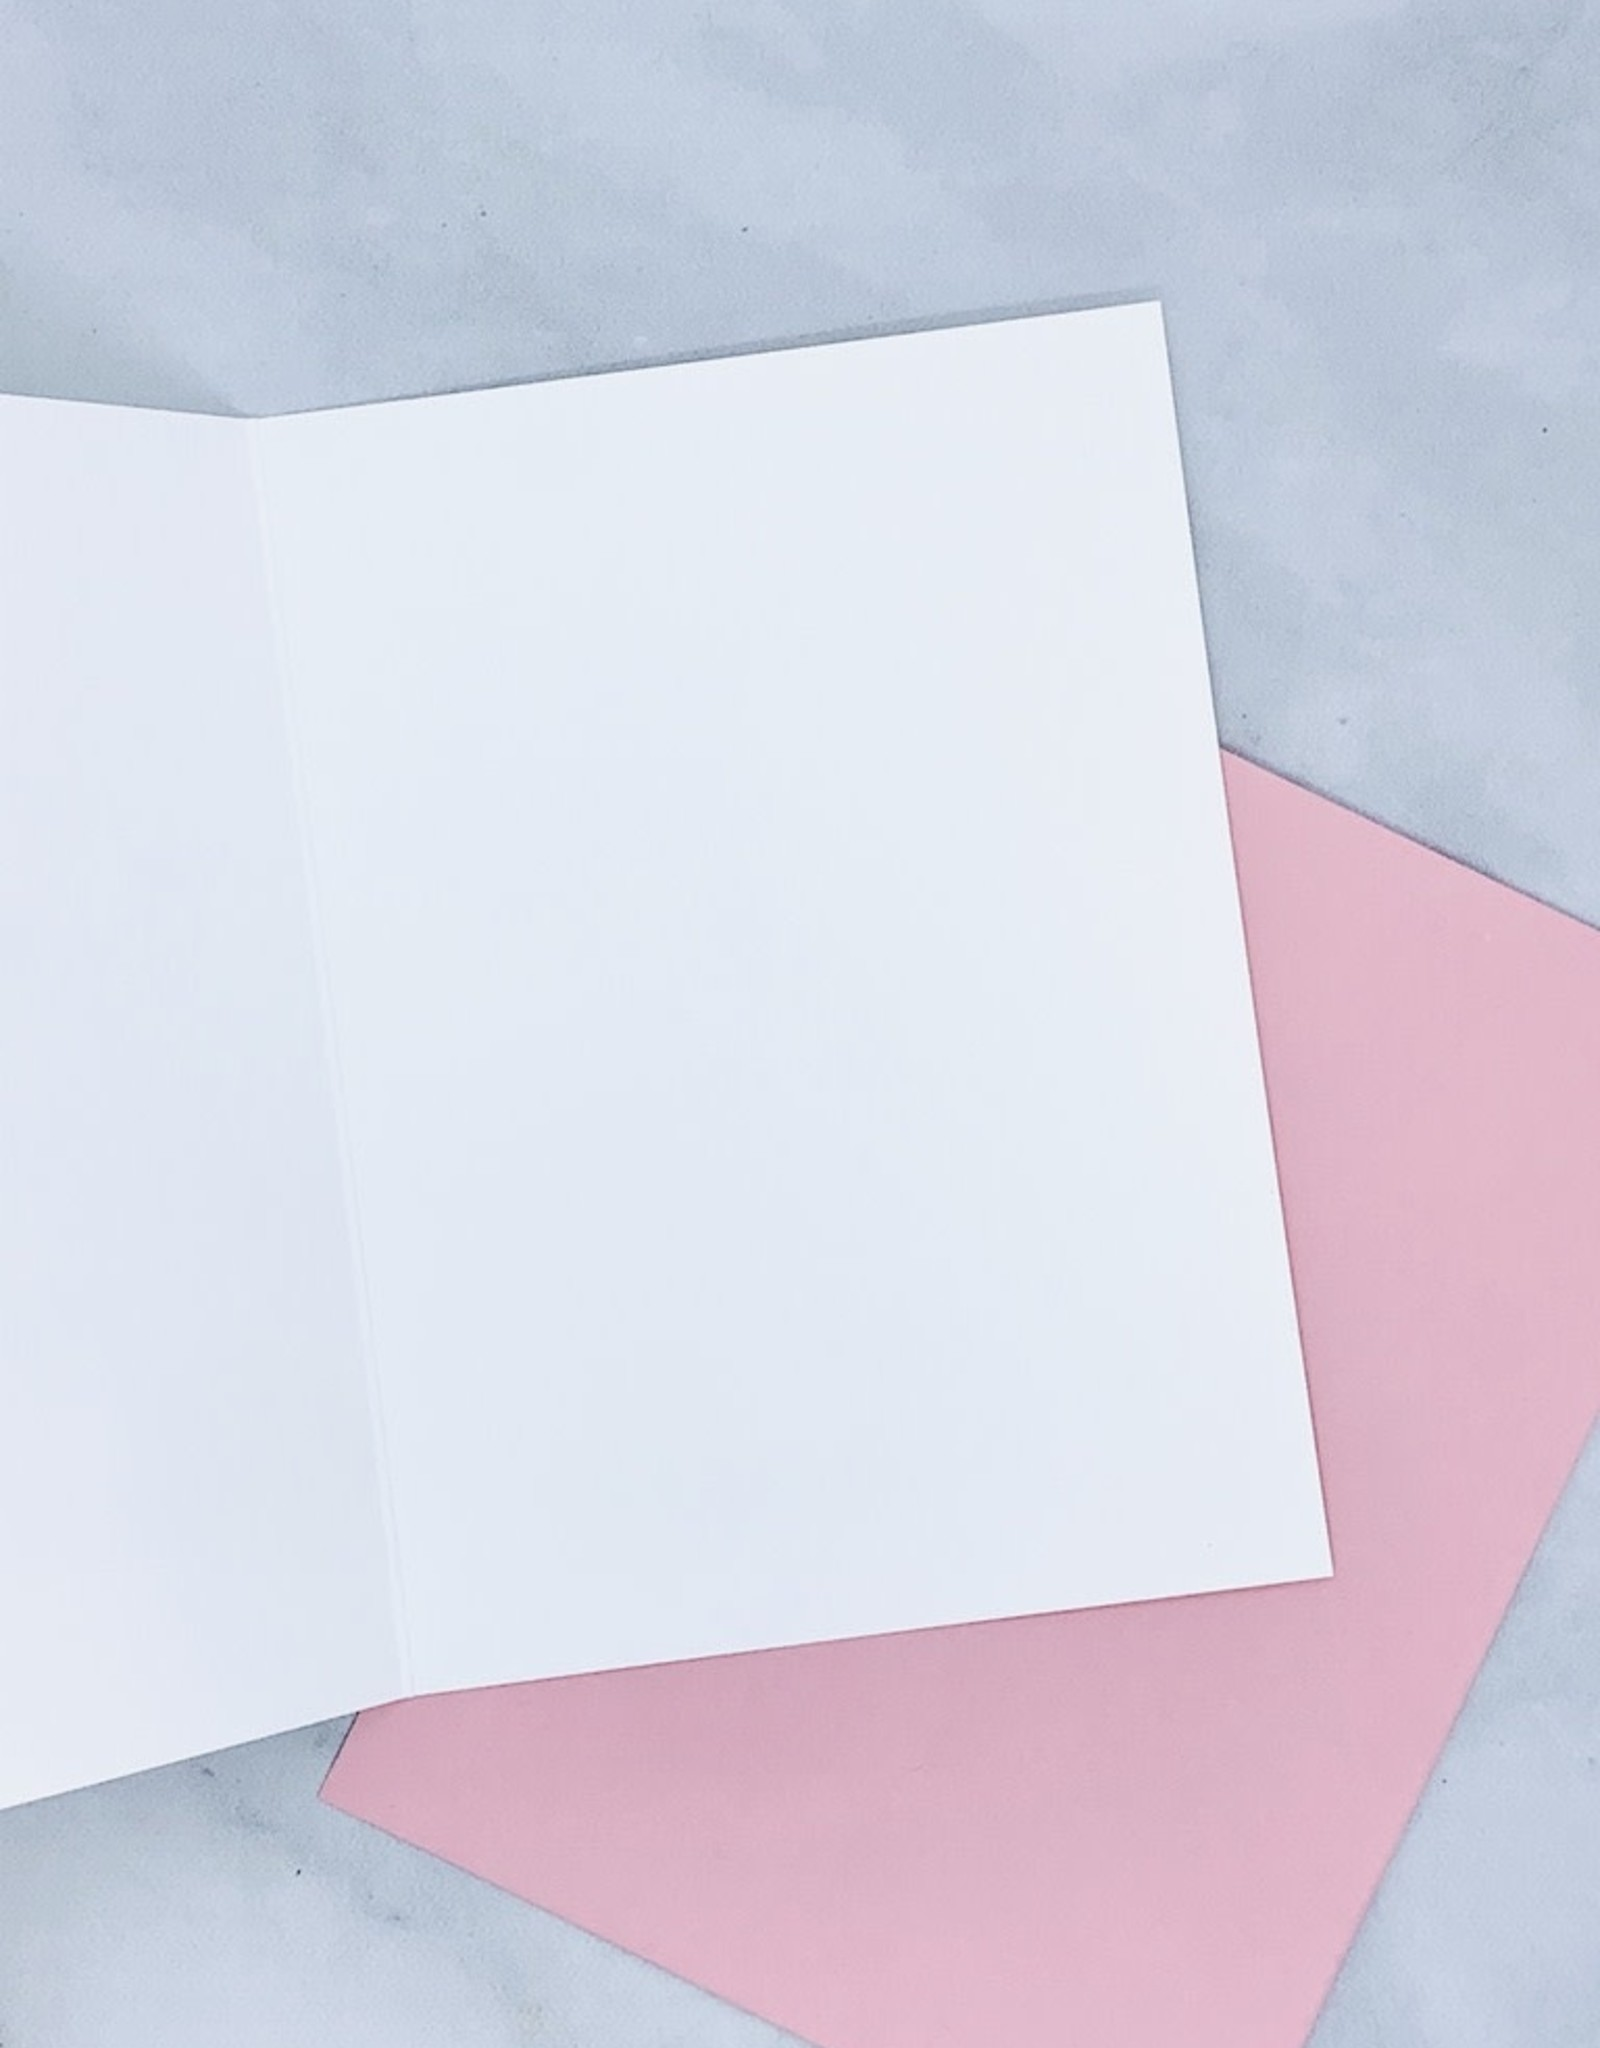 Mr. Boddington's Studio The Day the World Returns Card